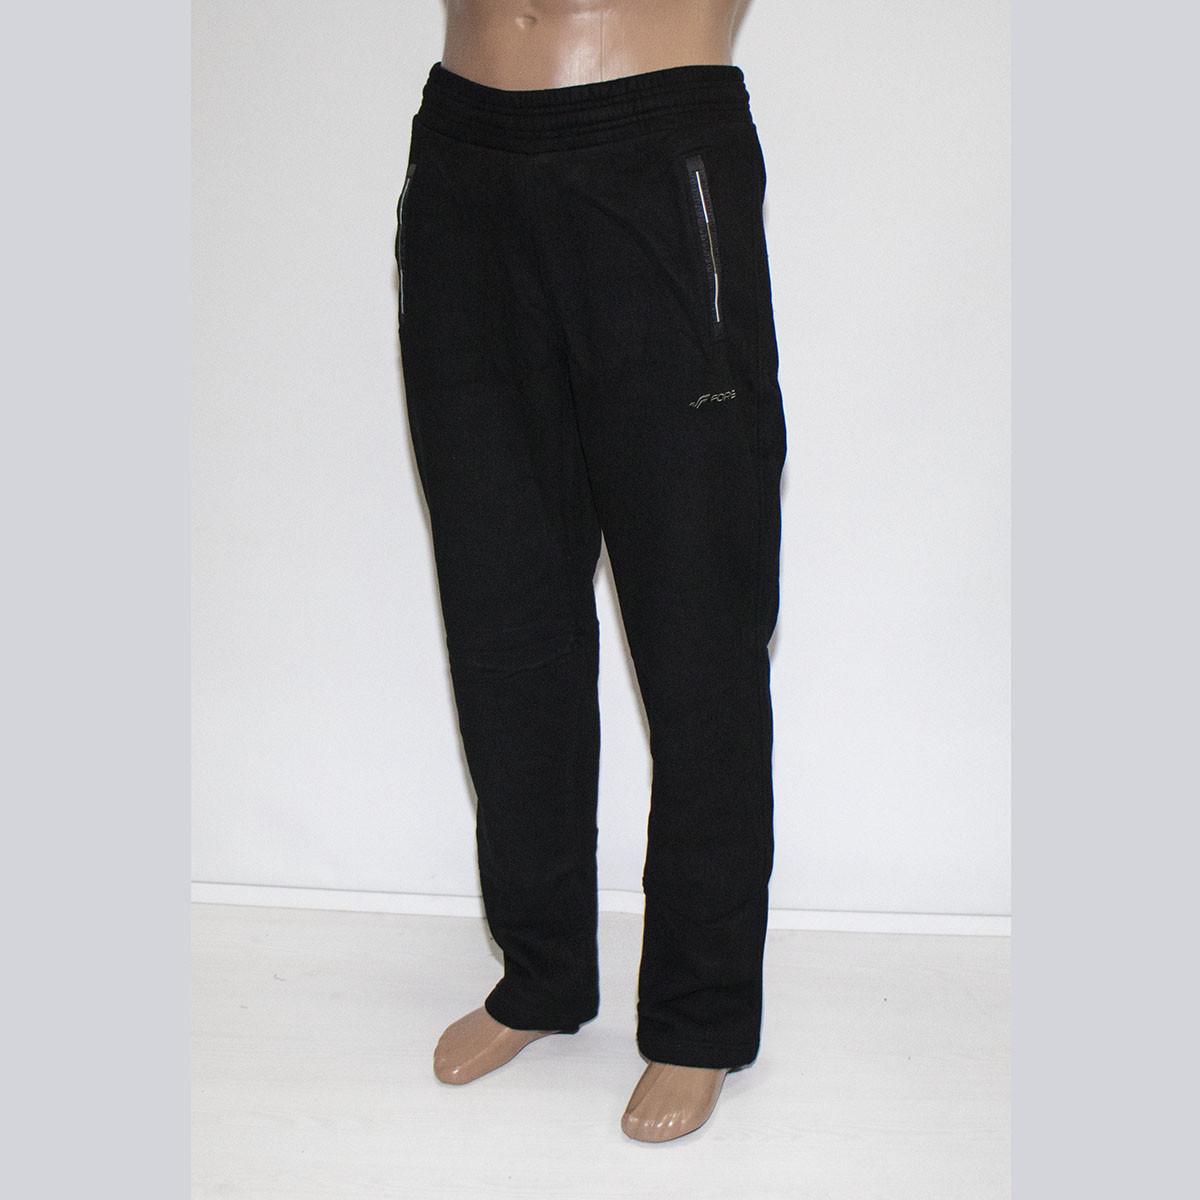 Зимние спортивные штаны на мужчин трехнитка фабрика Турция тм. FORE 1138